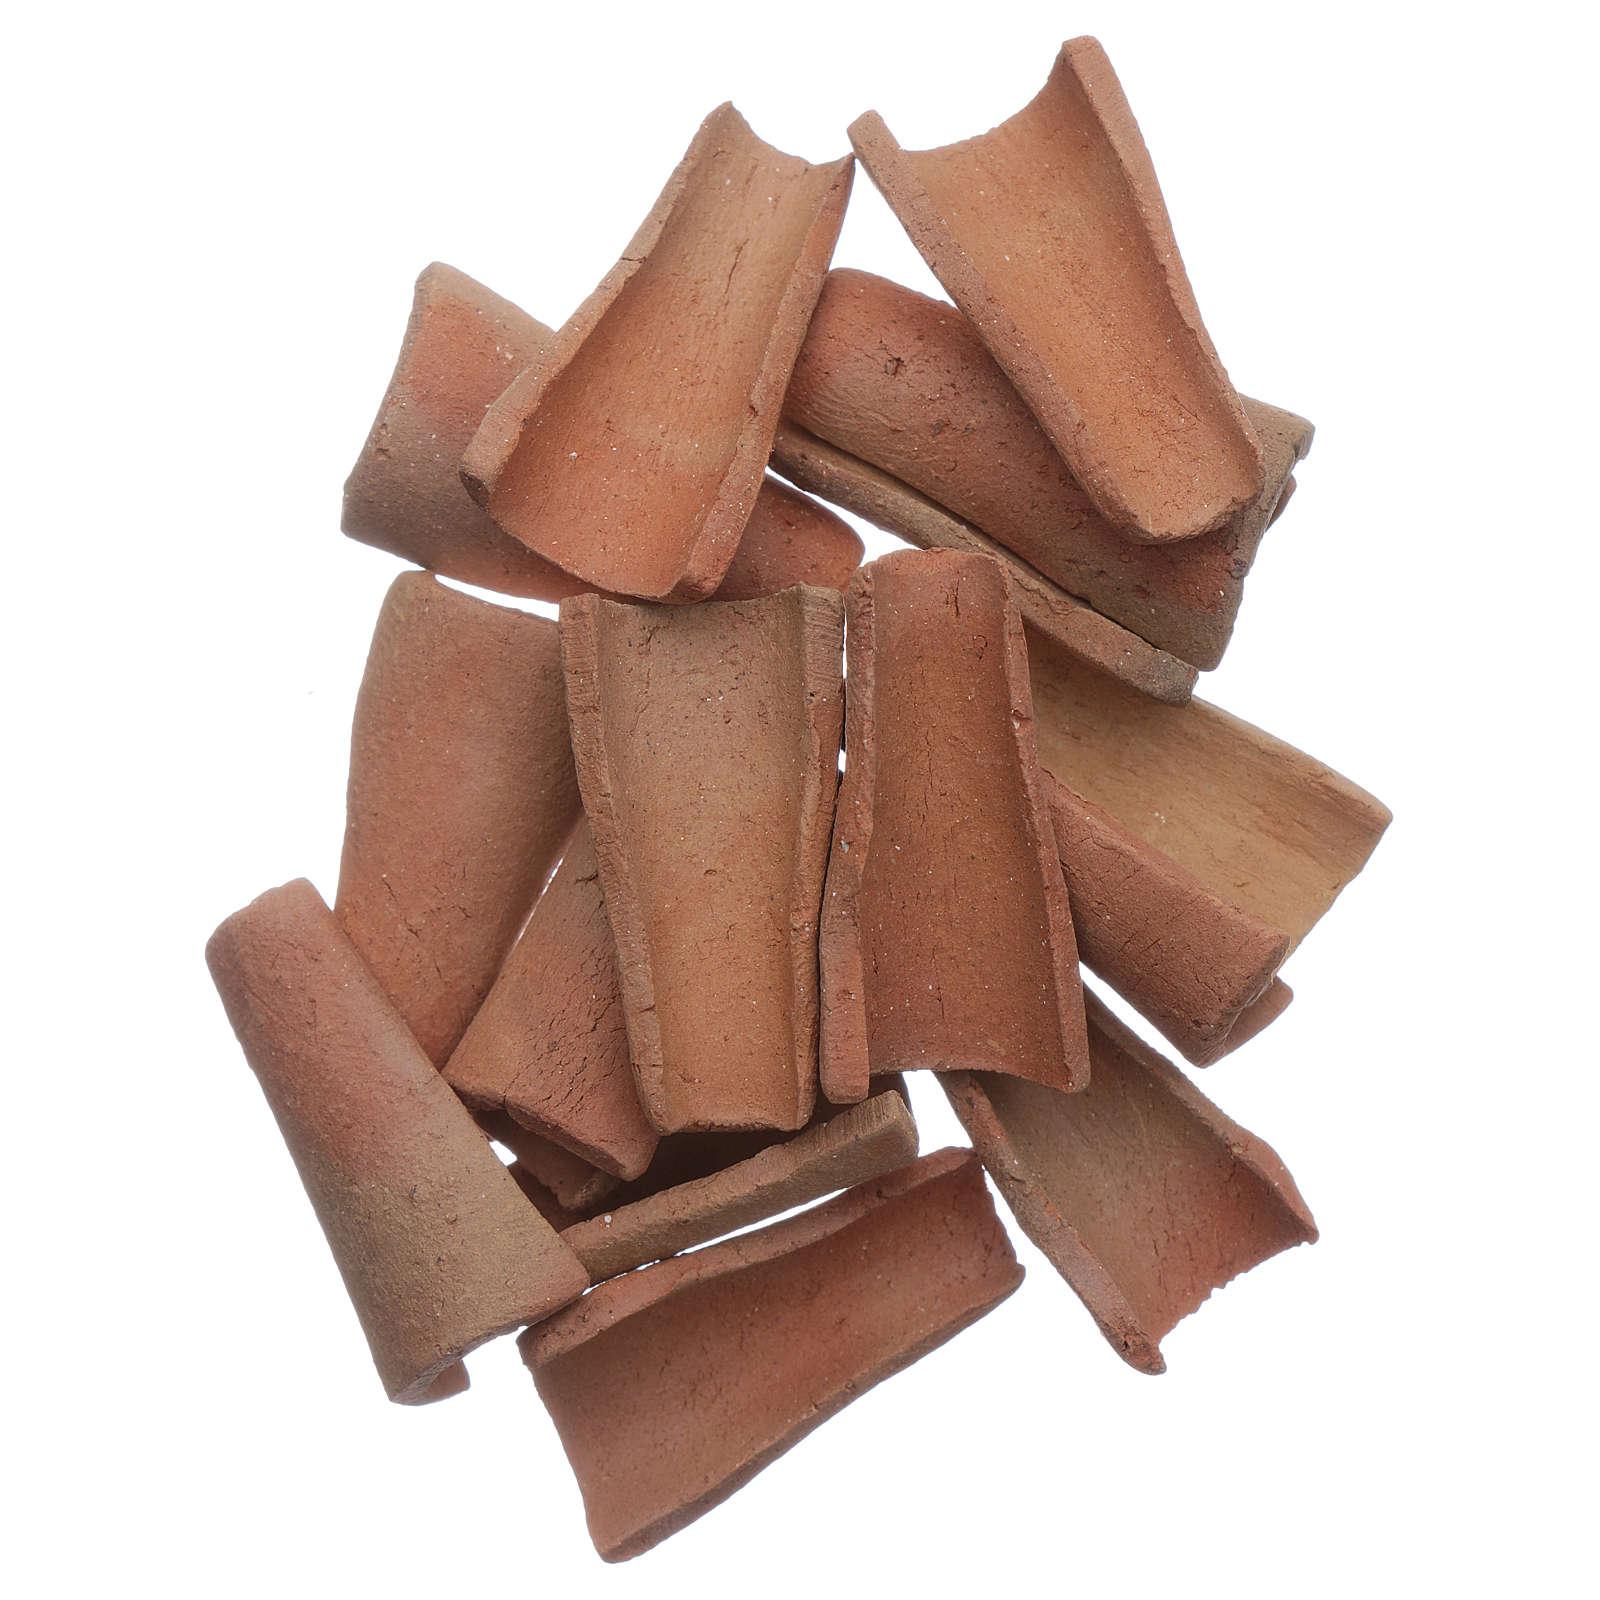 Coppi terracotta 100 pz presepe 3x1,6x1 cm 4